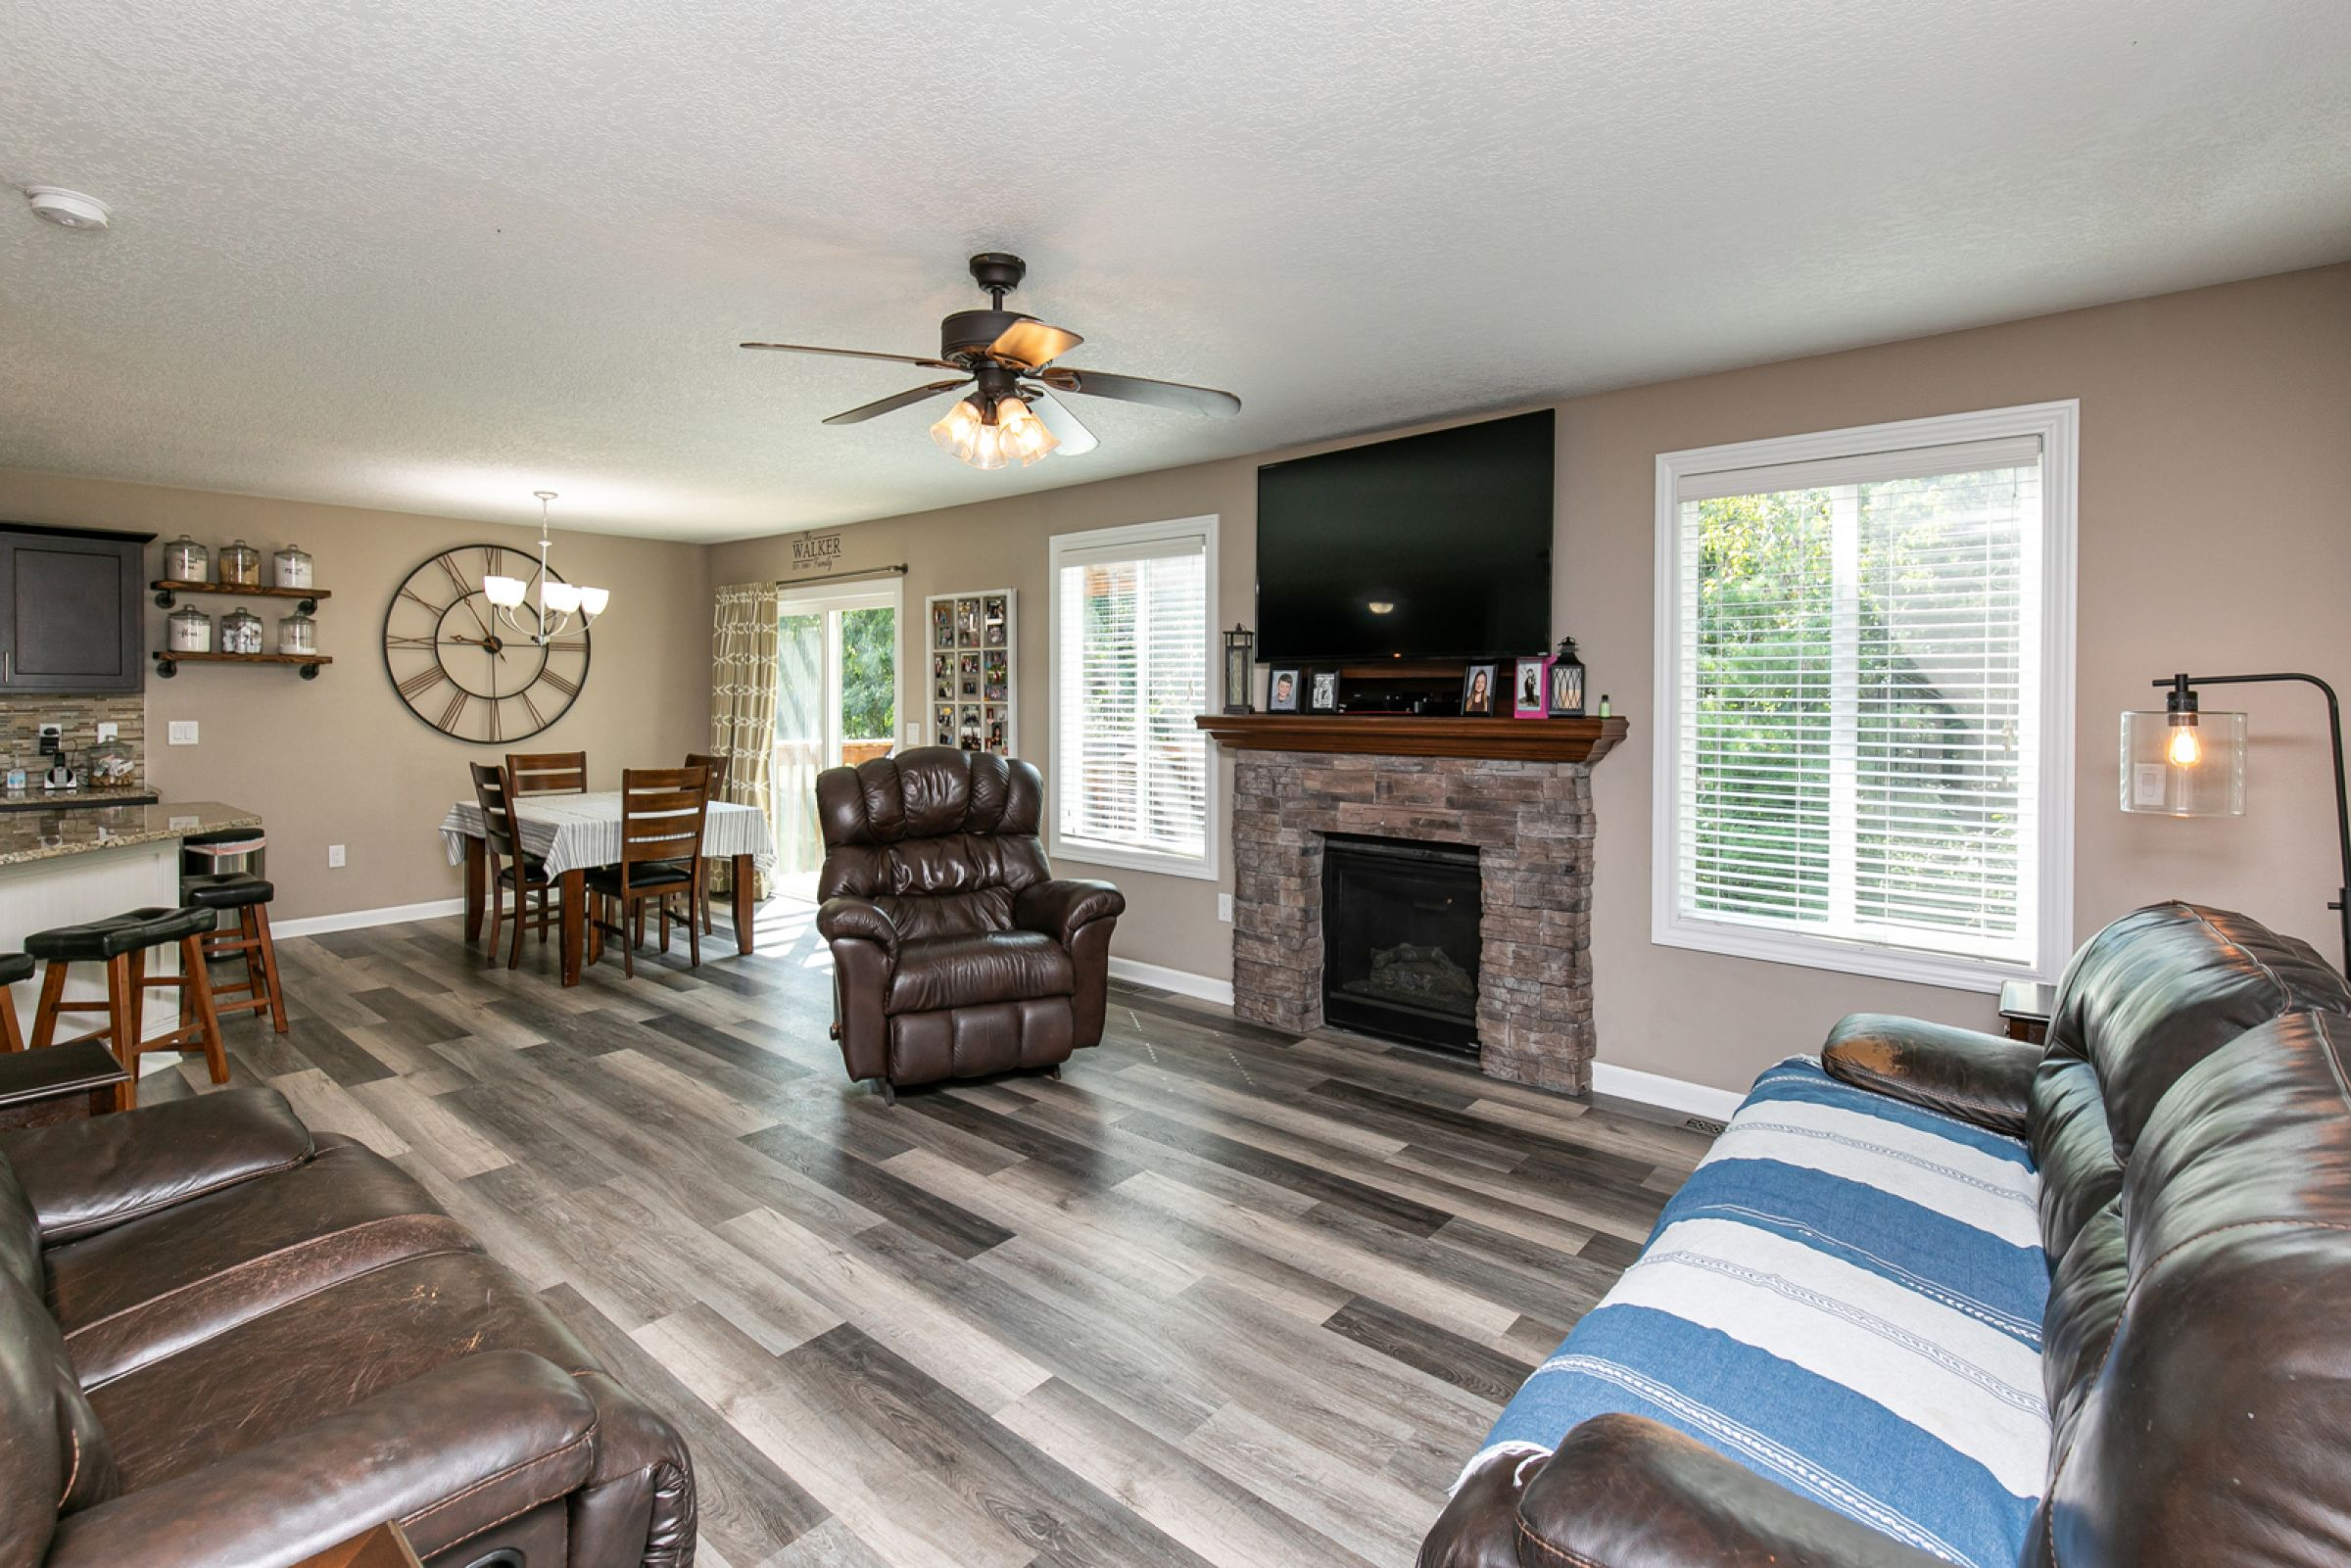 residential-warren-county-iowa-0-acres-listing-number-15685-3-2021-08-31-032156.jpg